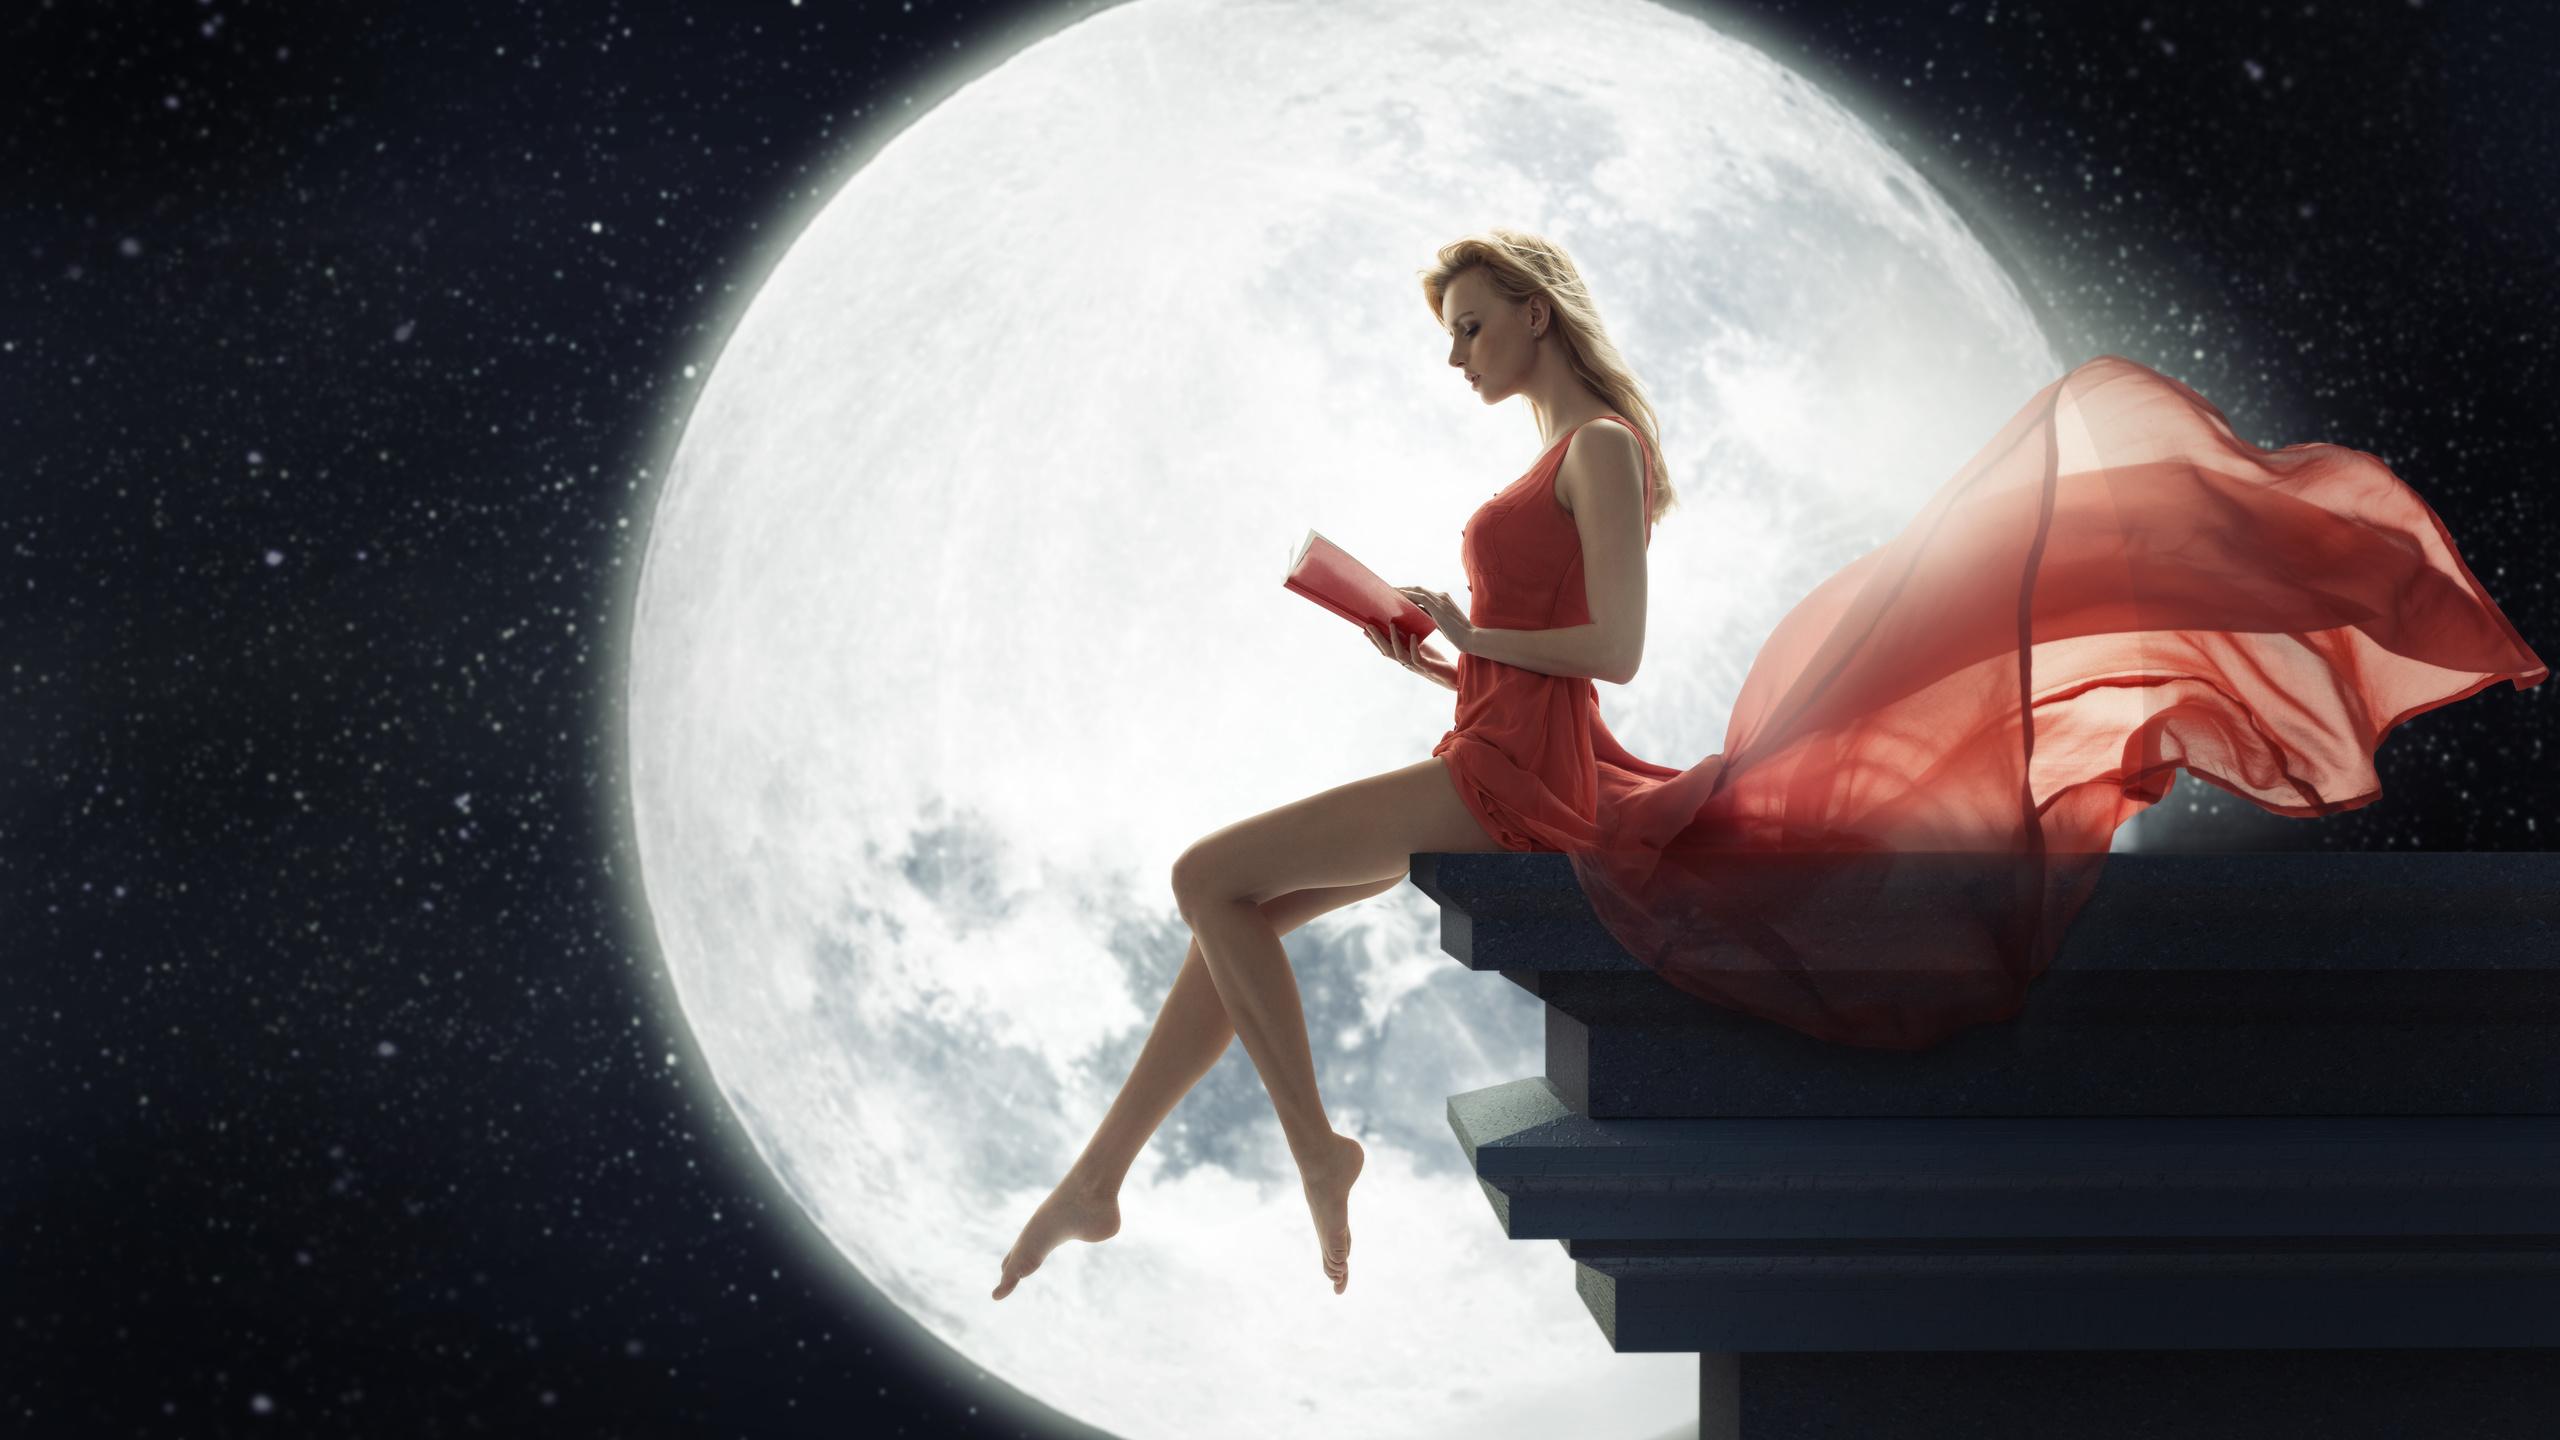 Класс картинки, картинки с луной и девушкой